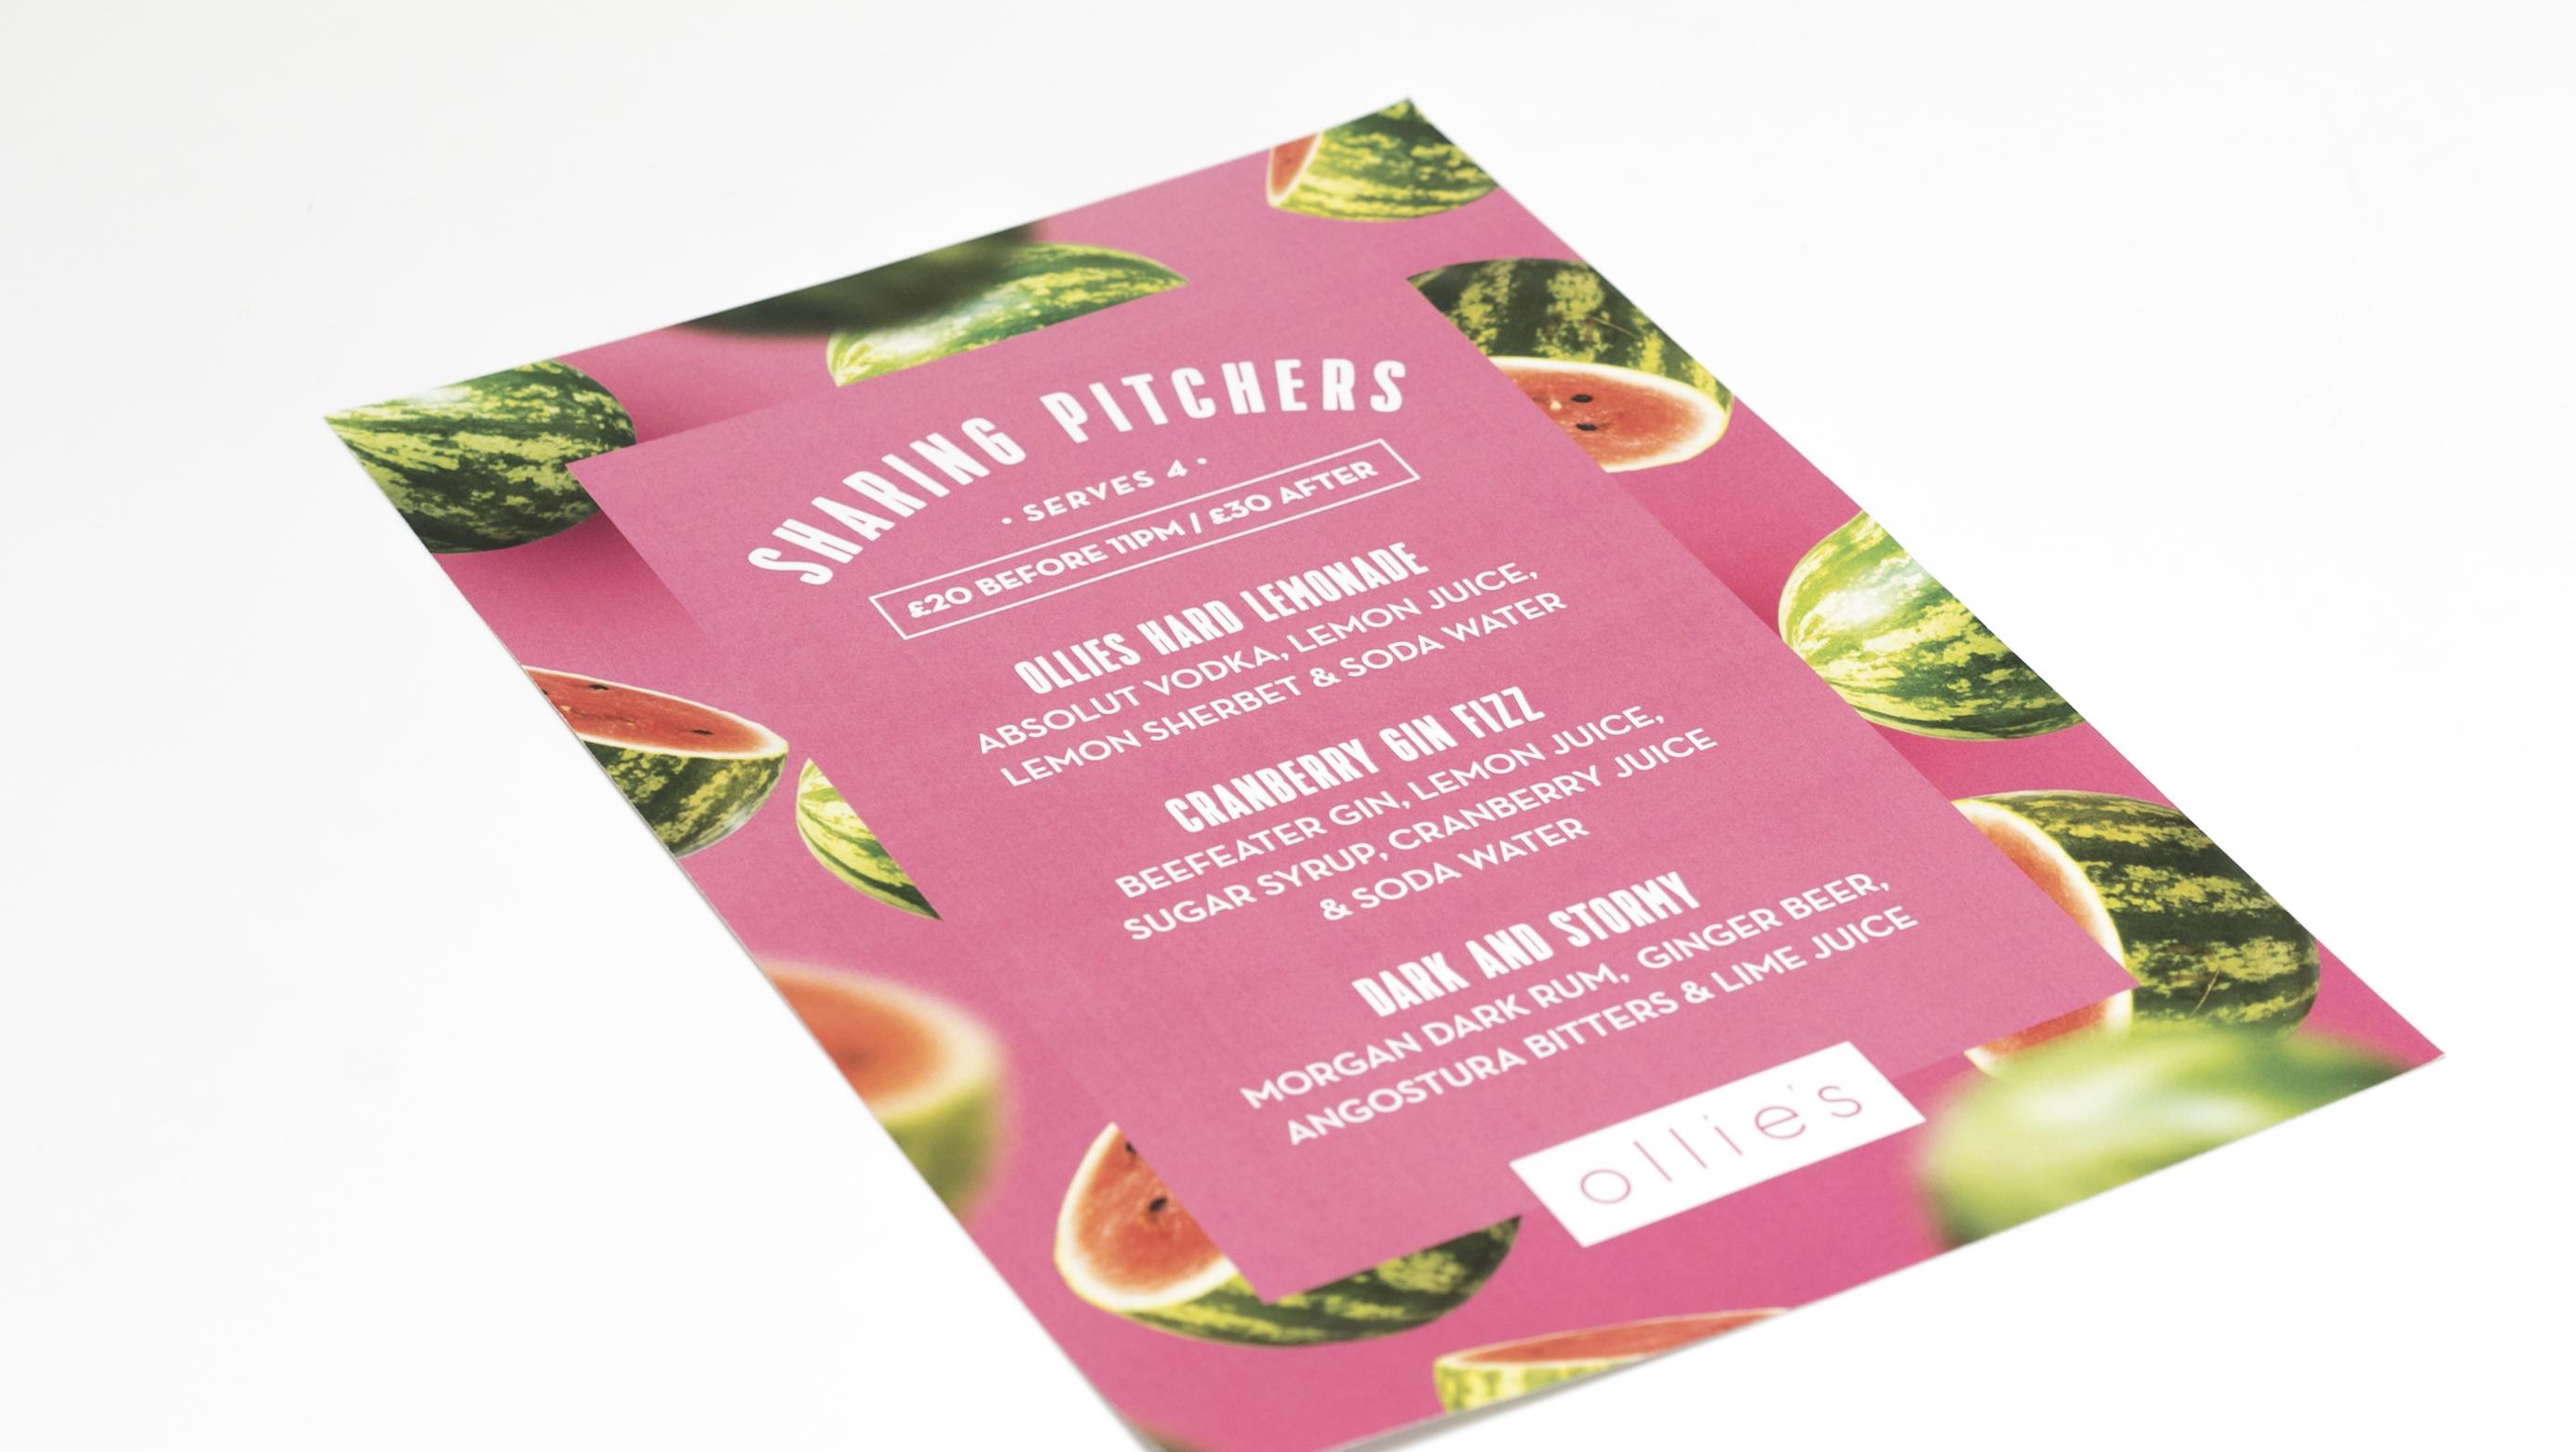 A3 Poster - Ollies - Large Format Poster Printing - Belfast Printing - Kaizen Print